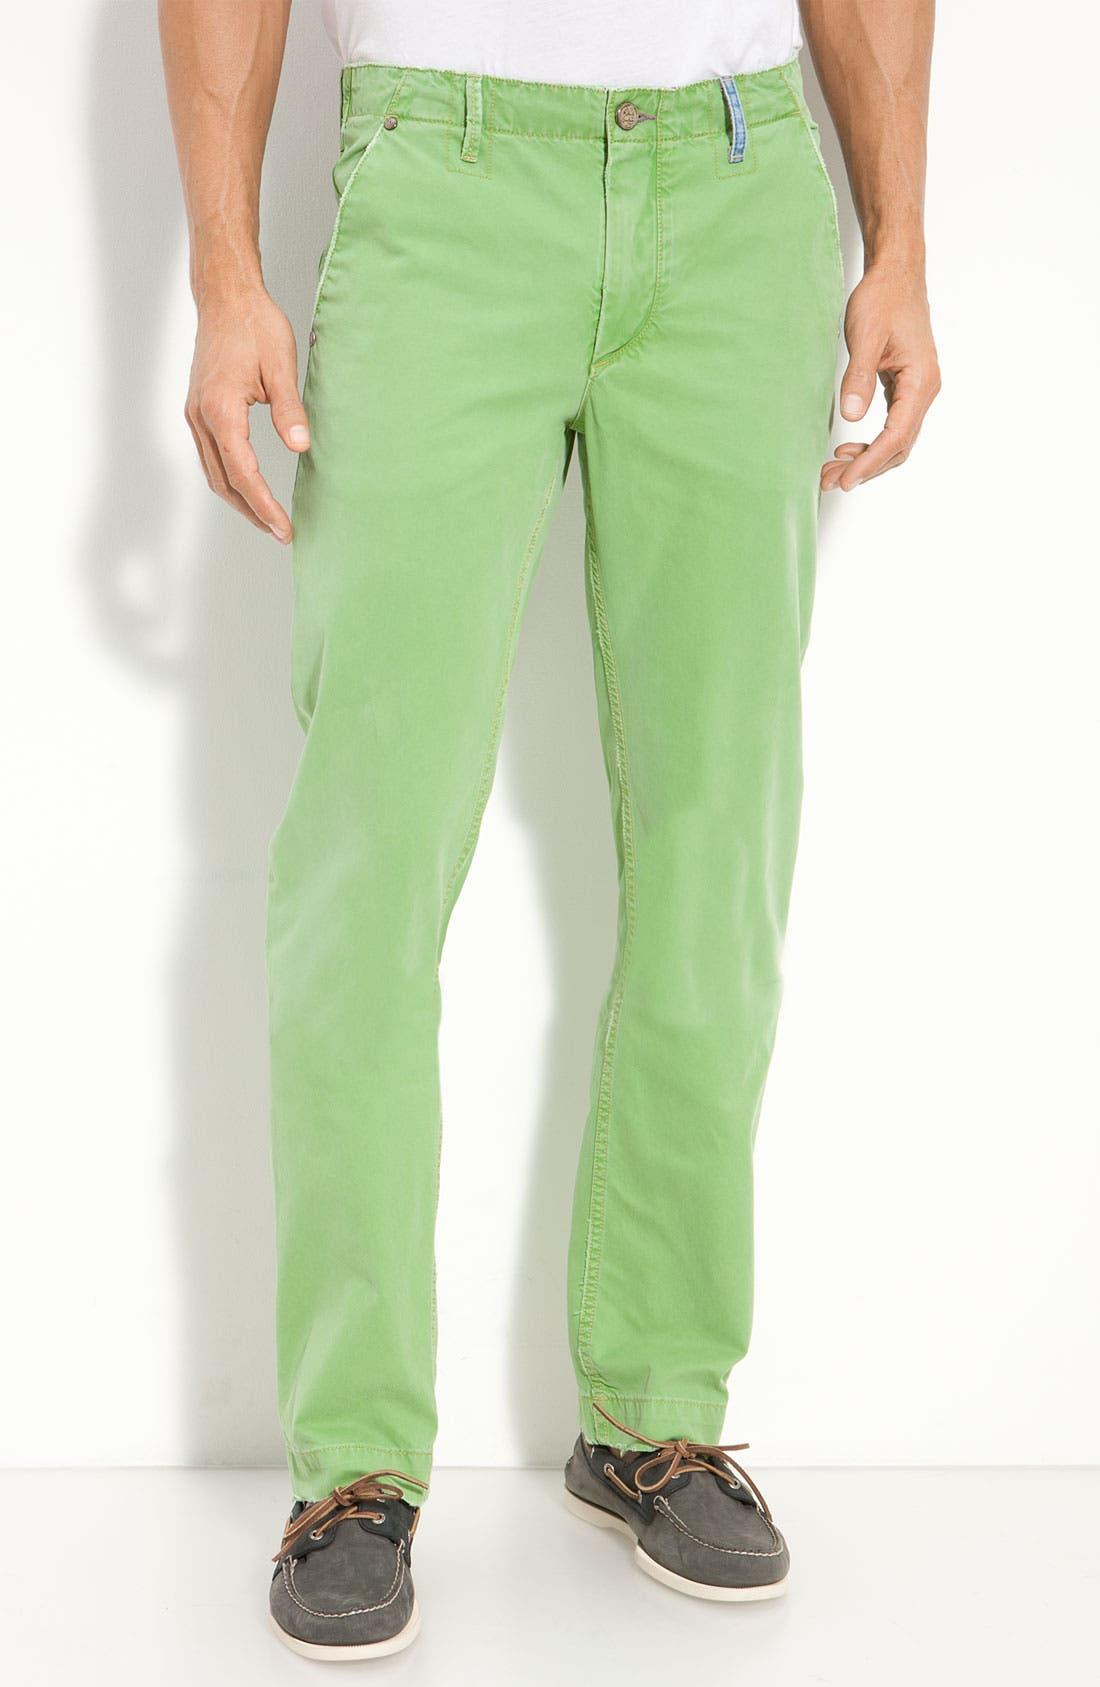 Main Image - Robert Graham Jeans 'Yates' Classic Fit Pants